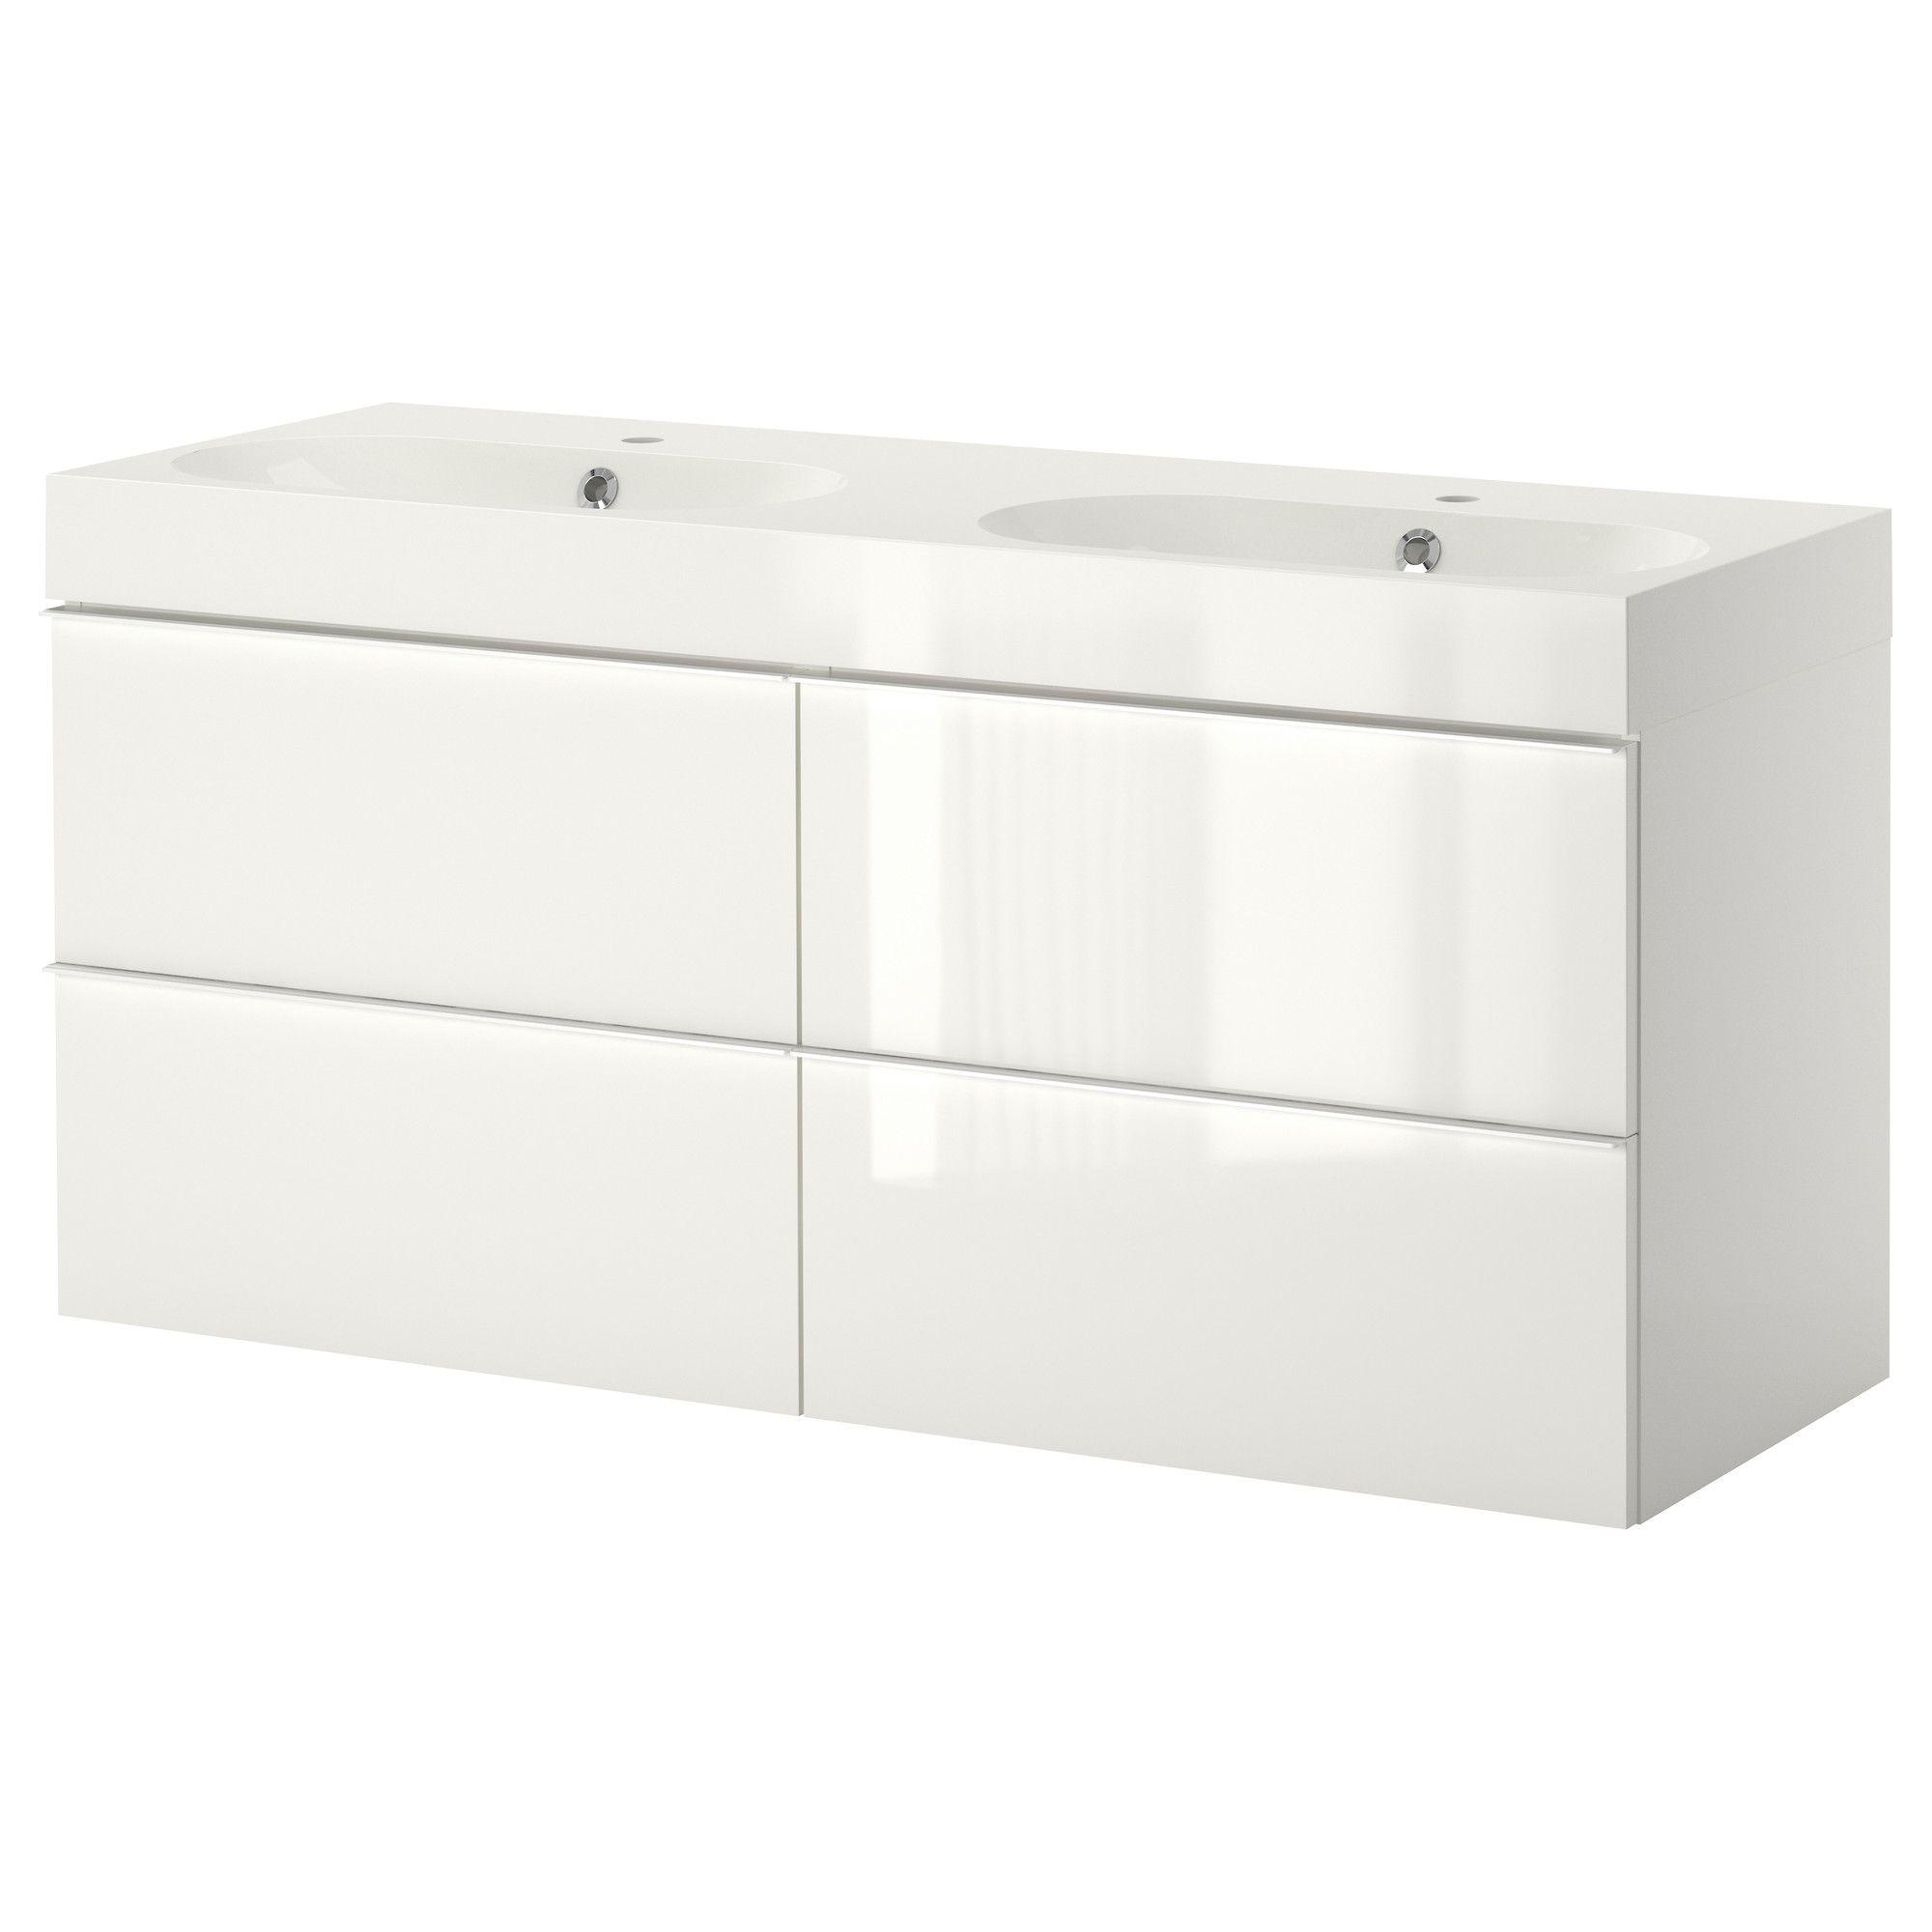 godmorgon/brÅviken sink cabinet with 4 drawers - high gloss white